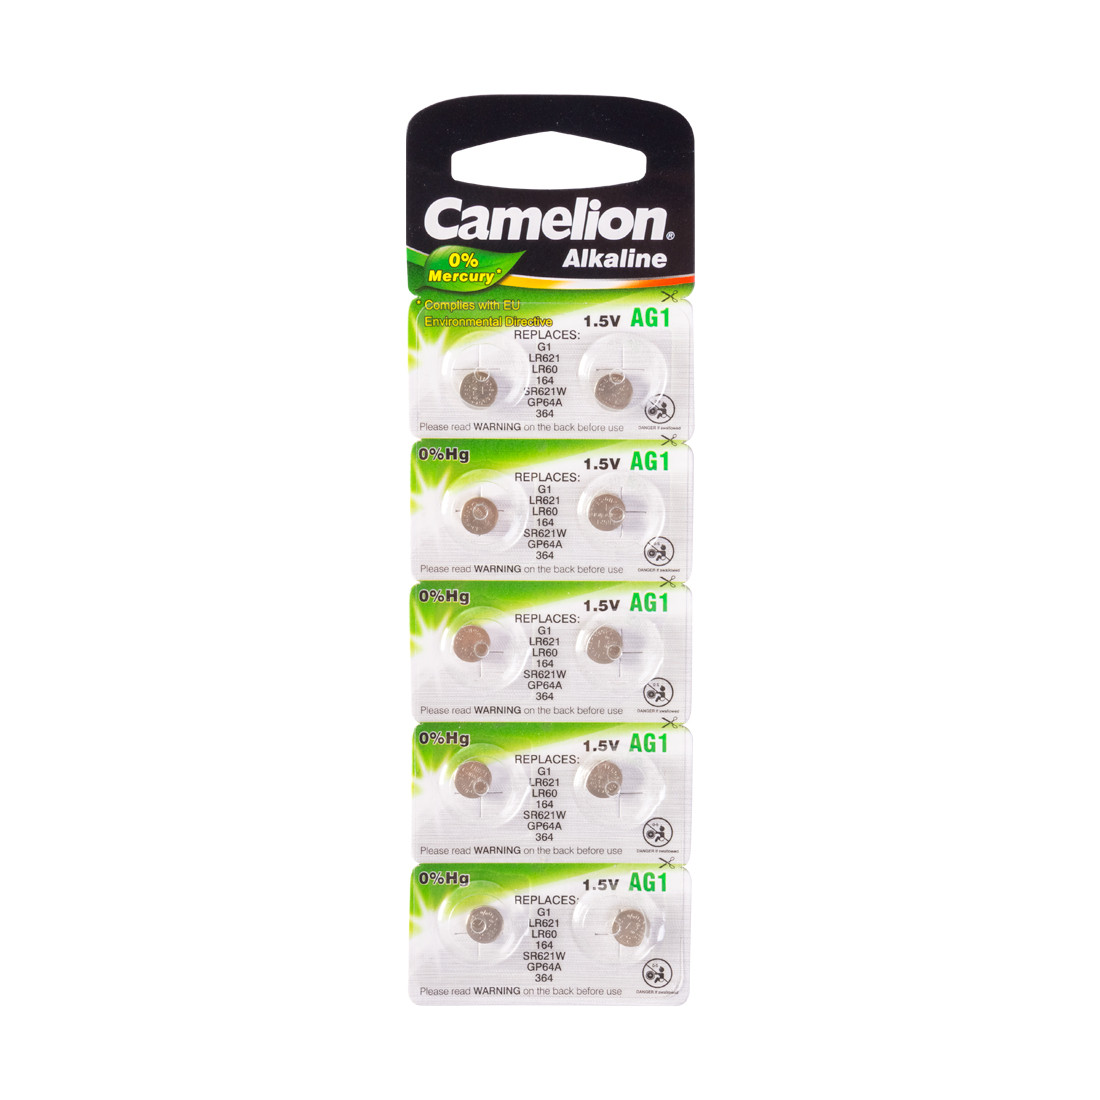 CAMELION AG1-BP10(0%Hg) Батарейка Alkaline, тип AG1, 1.5V, 0% Ртути, 10 шт. в блистере